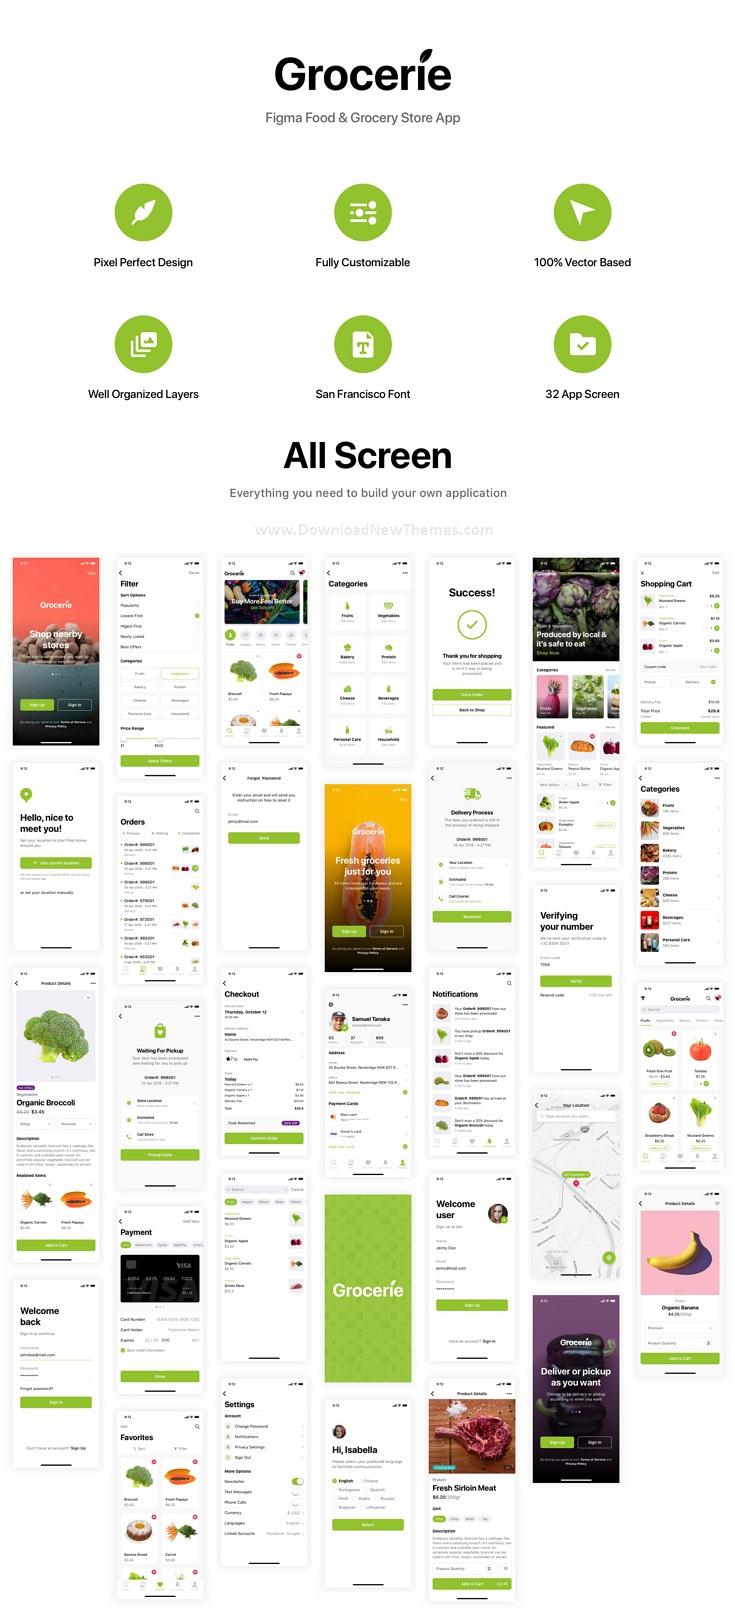 Food & Grocery Store App